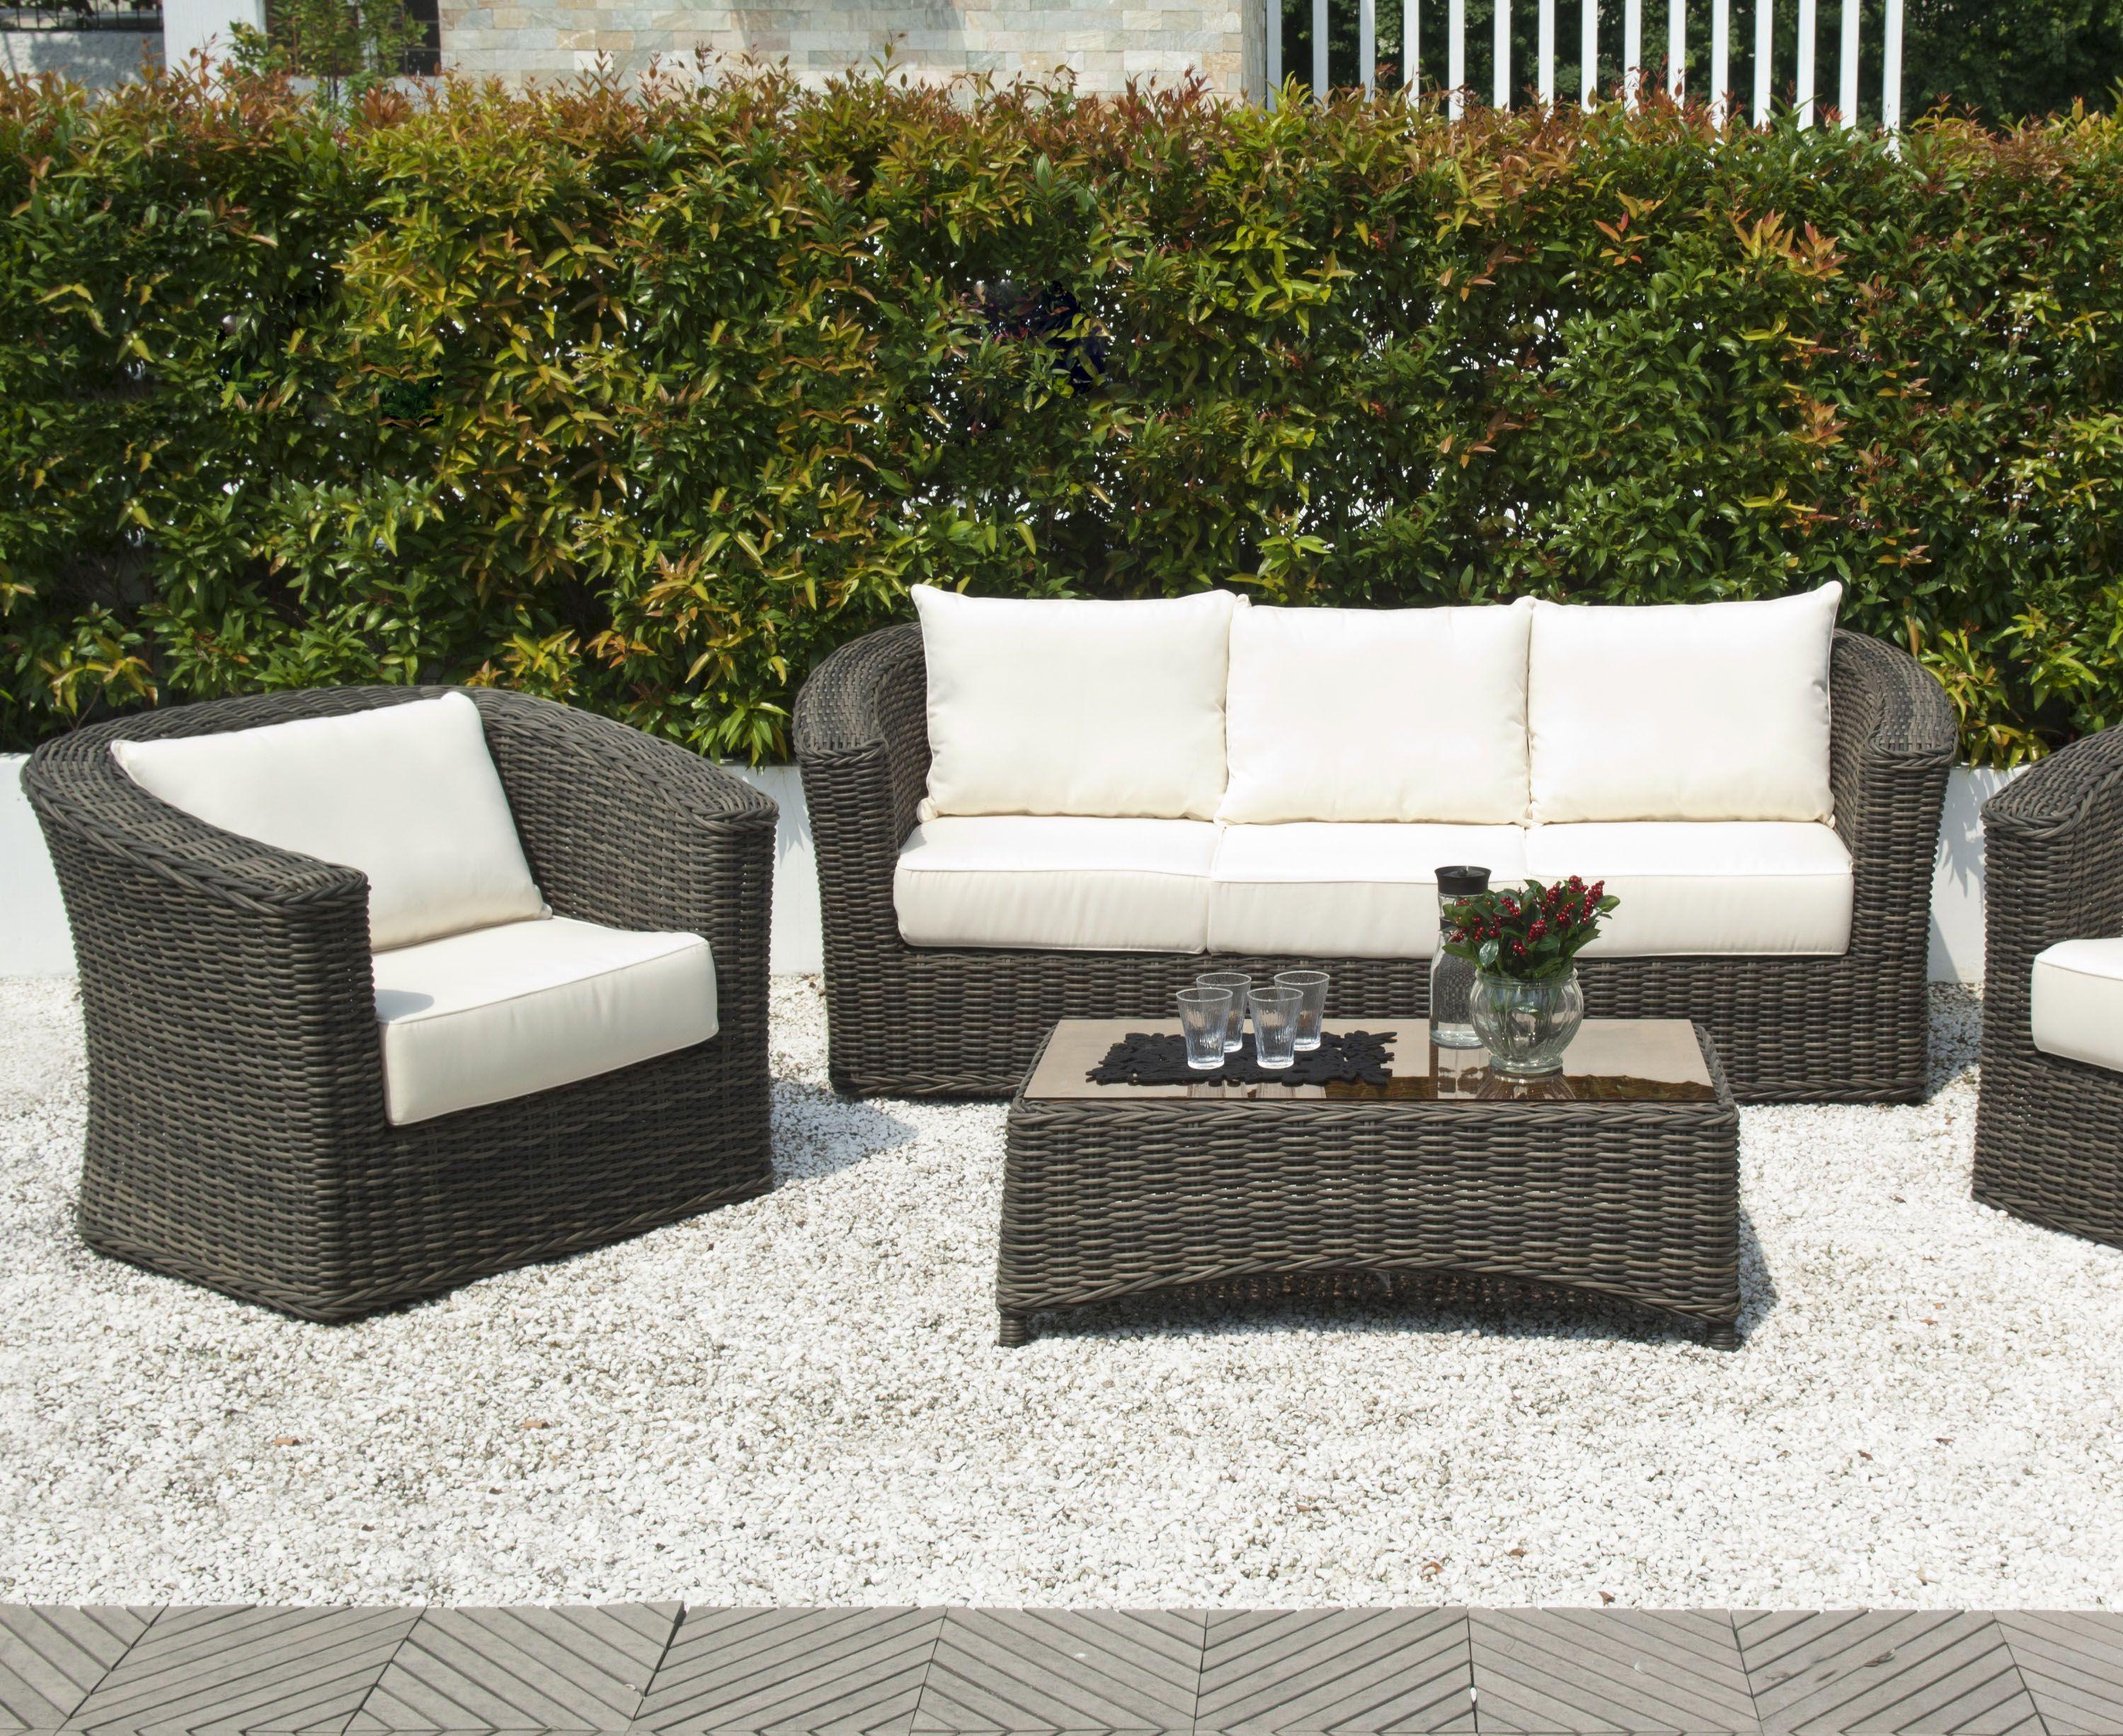 Cubre sofas leroy merlin good trendy de bao para casetas for Sofa exterior leroy